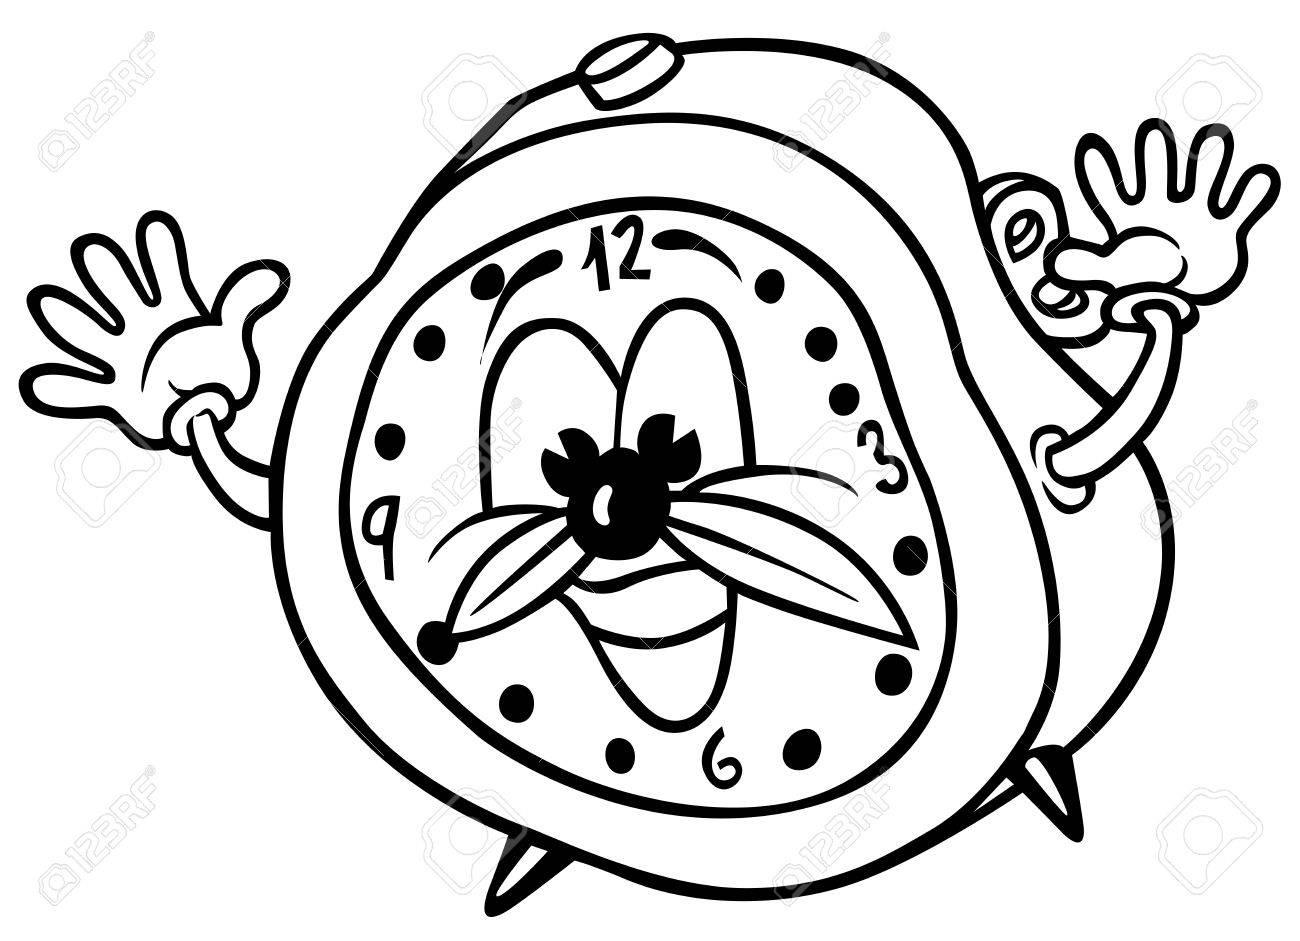 alarm clock black and white cartoon illustration royalty free rh 123rf com